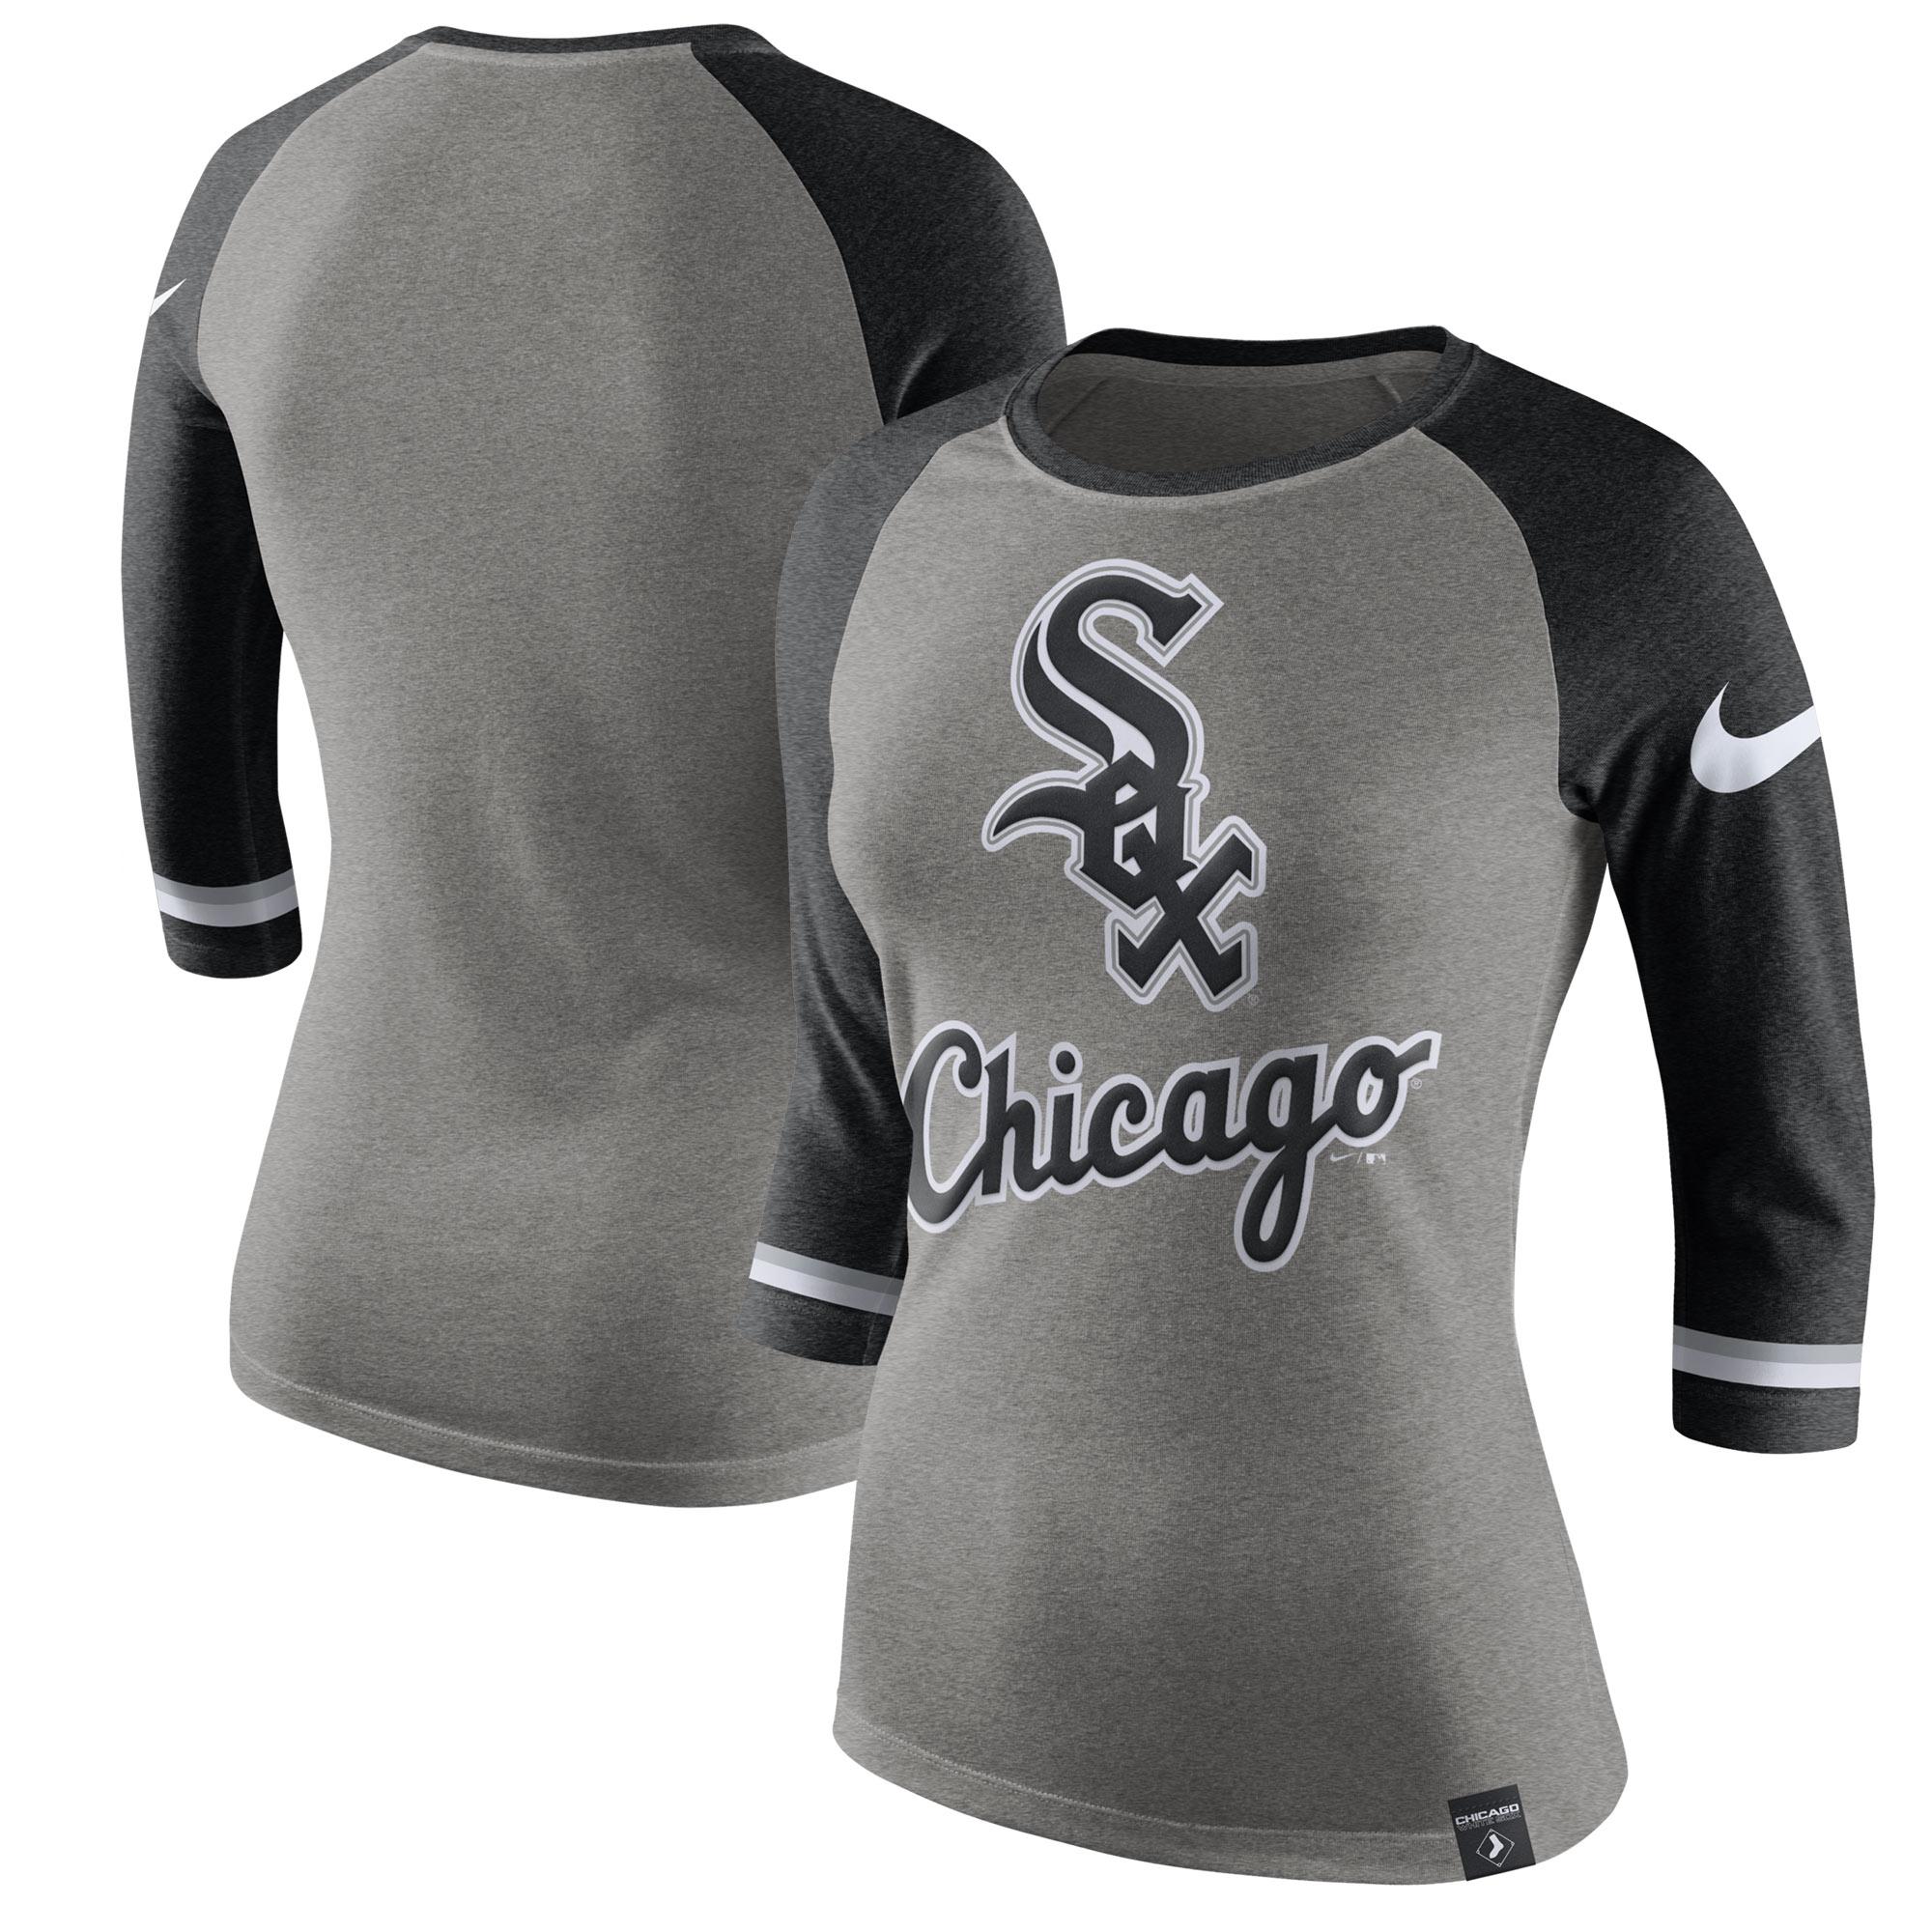 Chicago White Sox Nike Women's Tri-Blend 3/4-Sleeve Raglan T-Shirt - Heathered Gray